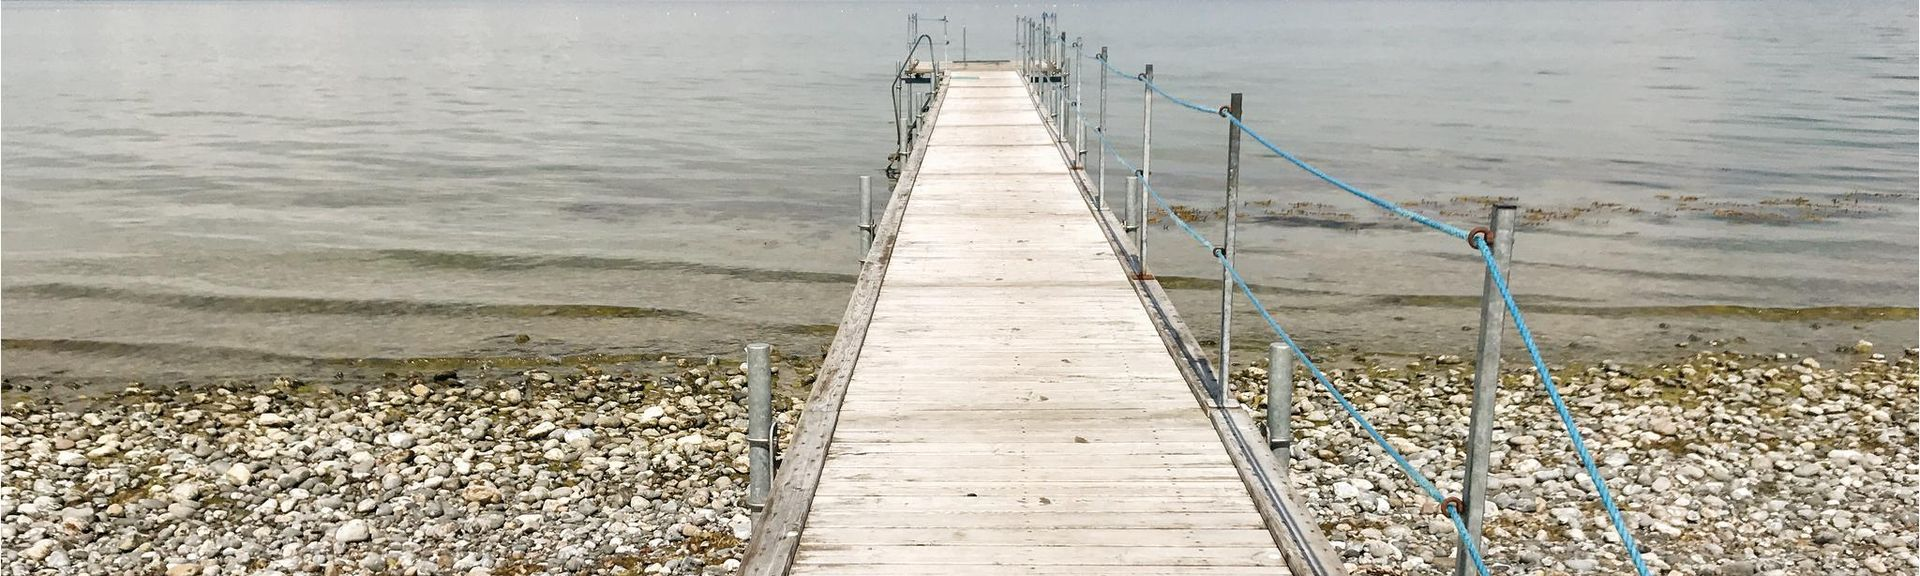 Solrod Strand, Regio Seeland, Denemarken